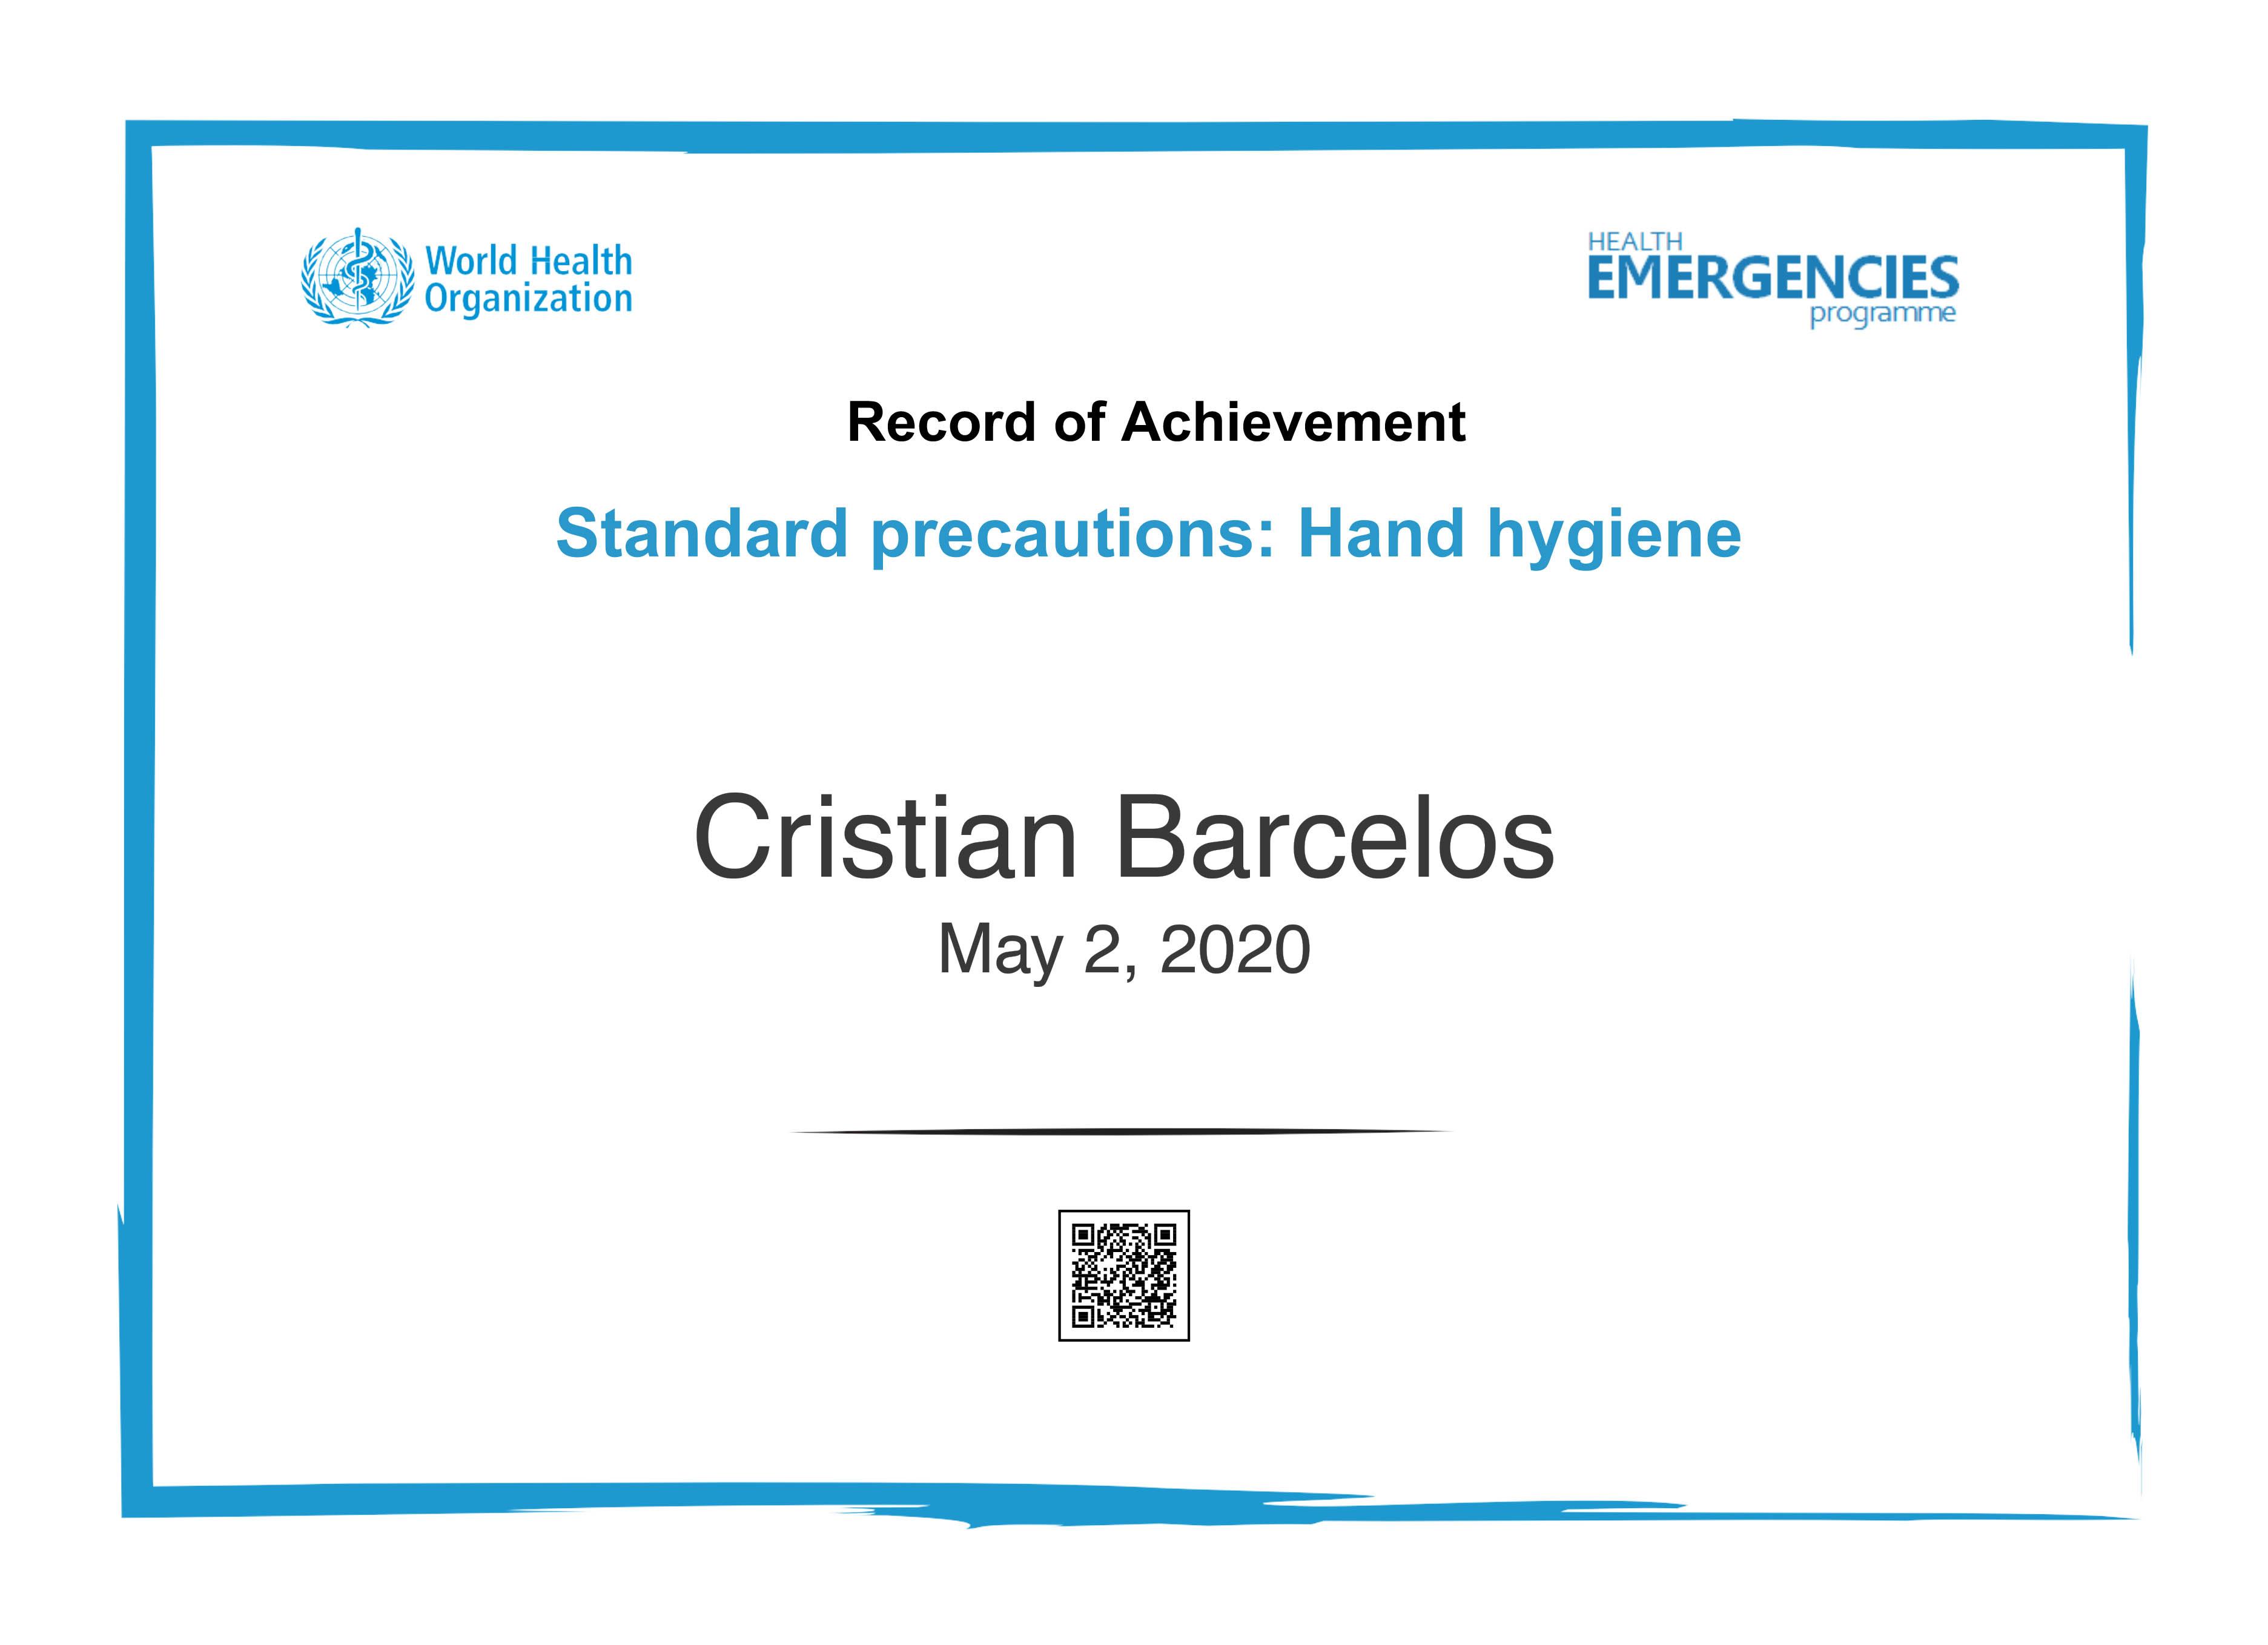 IPC-HH-en_RecordOfAchievement-1